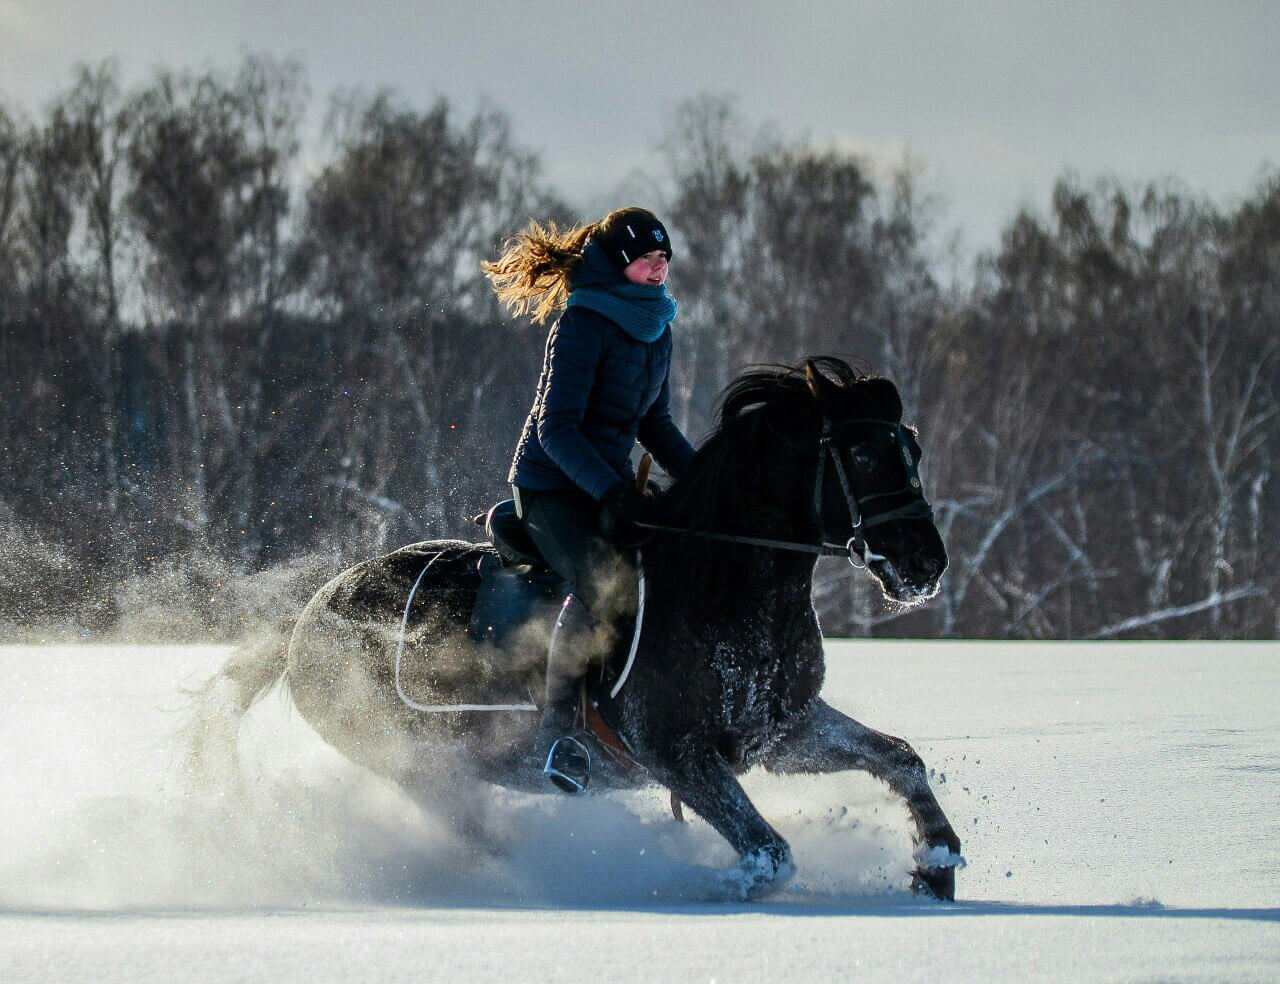 Конный парк Русь